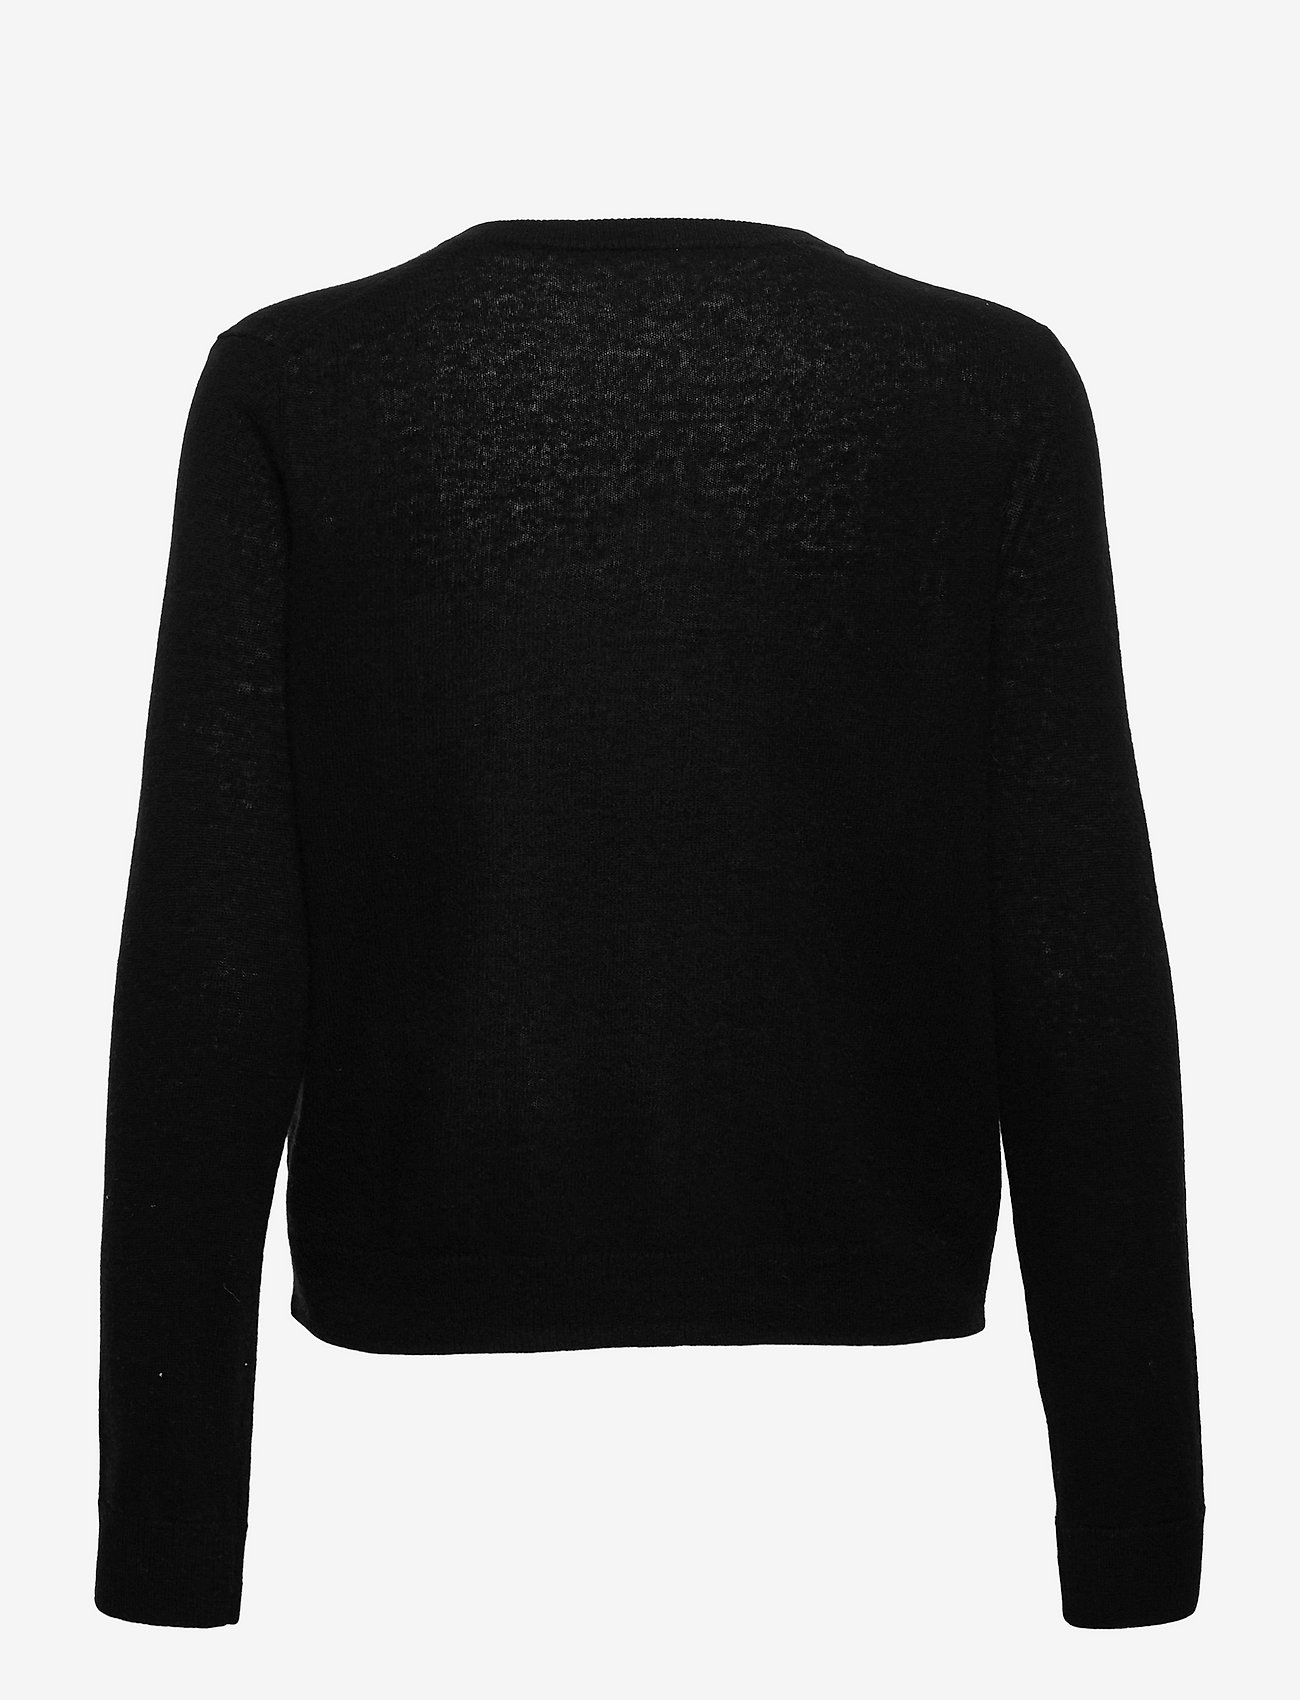 Selected Femme - SLFFUDGE CASHMERE LS KNIT CARDIGAN B - cardigans - black - 1